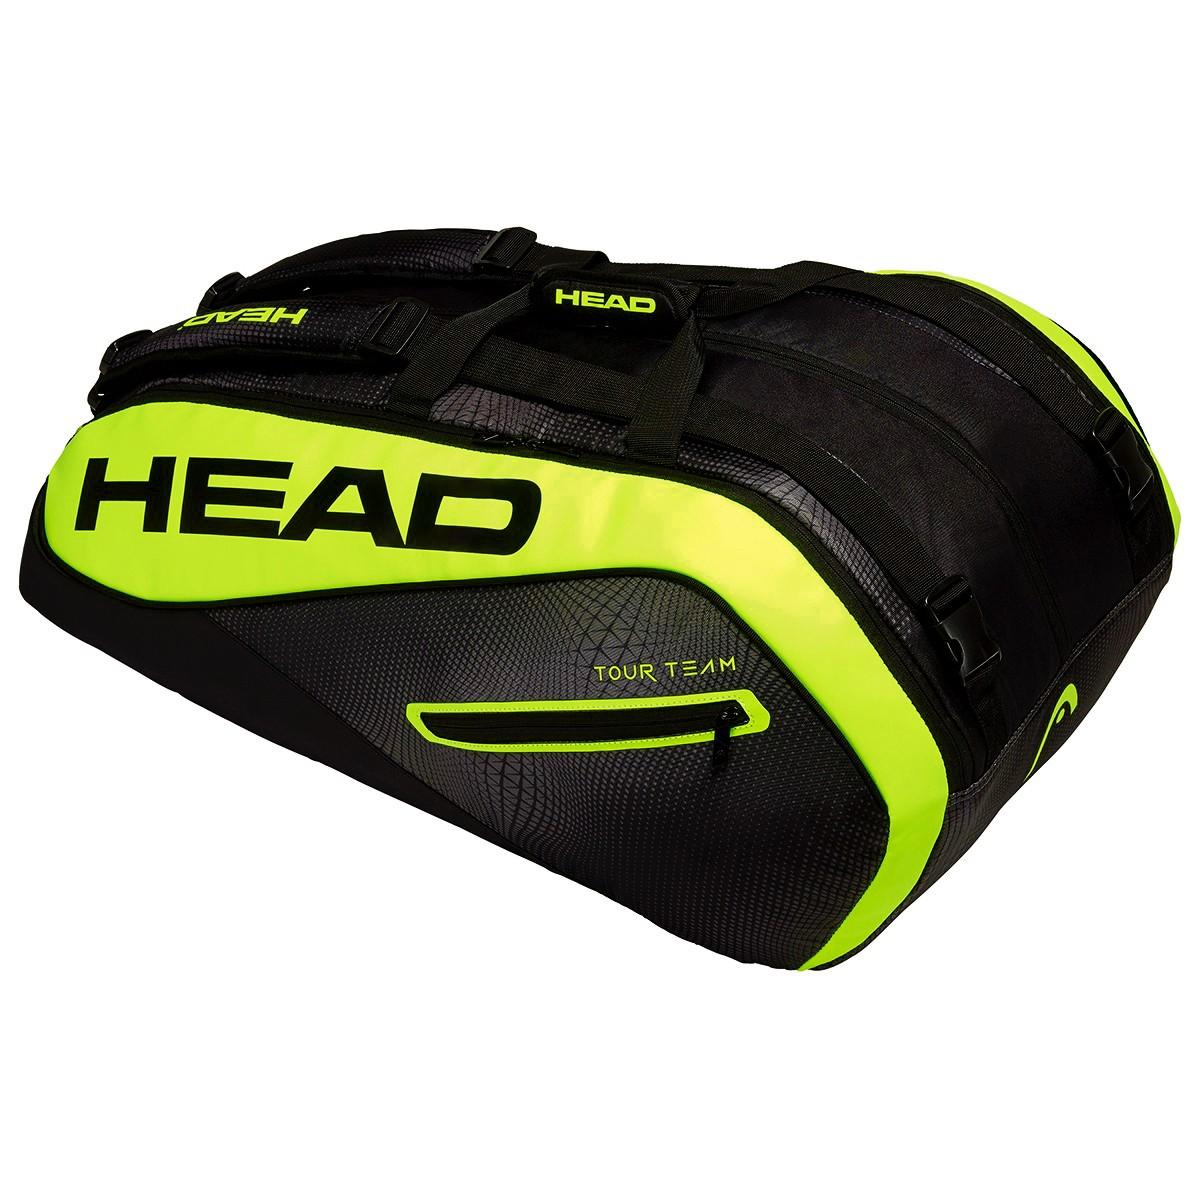 SAC DE TENNIS HEAD TOUR TEAM EXTREME 12R MONSTERCOMBI